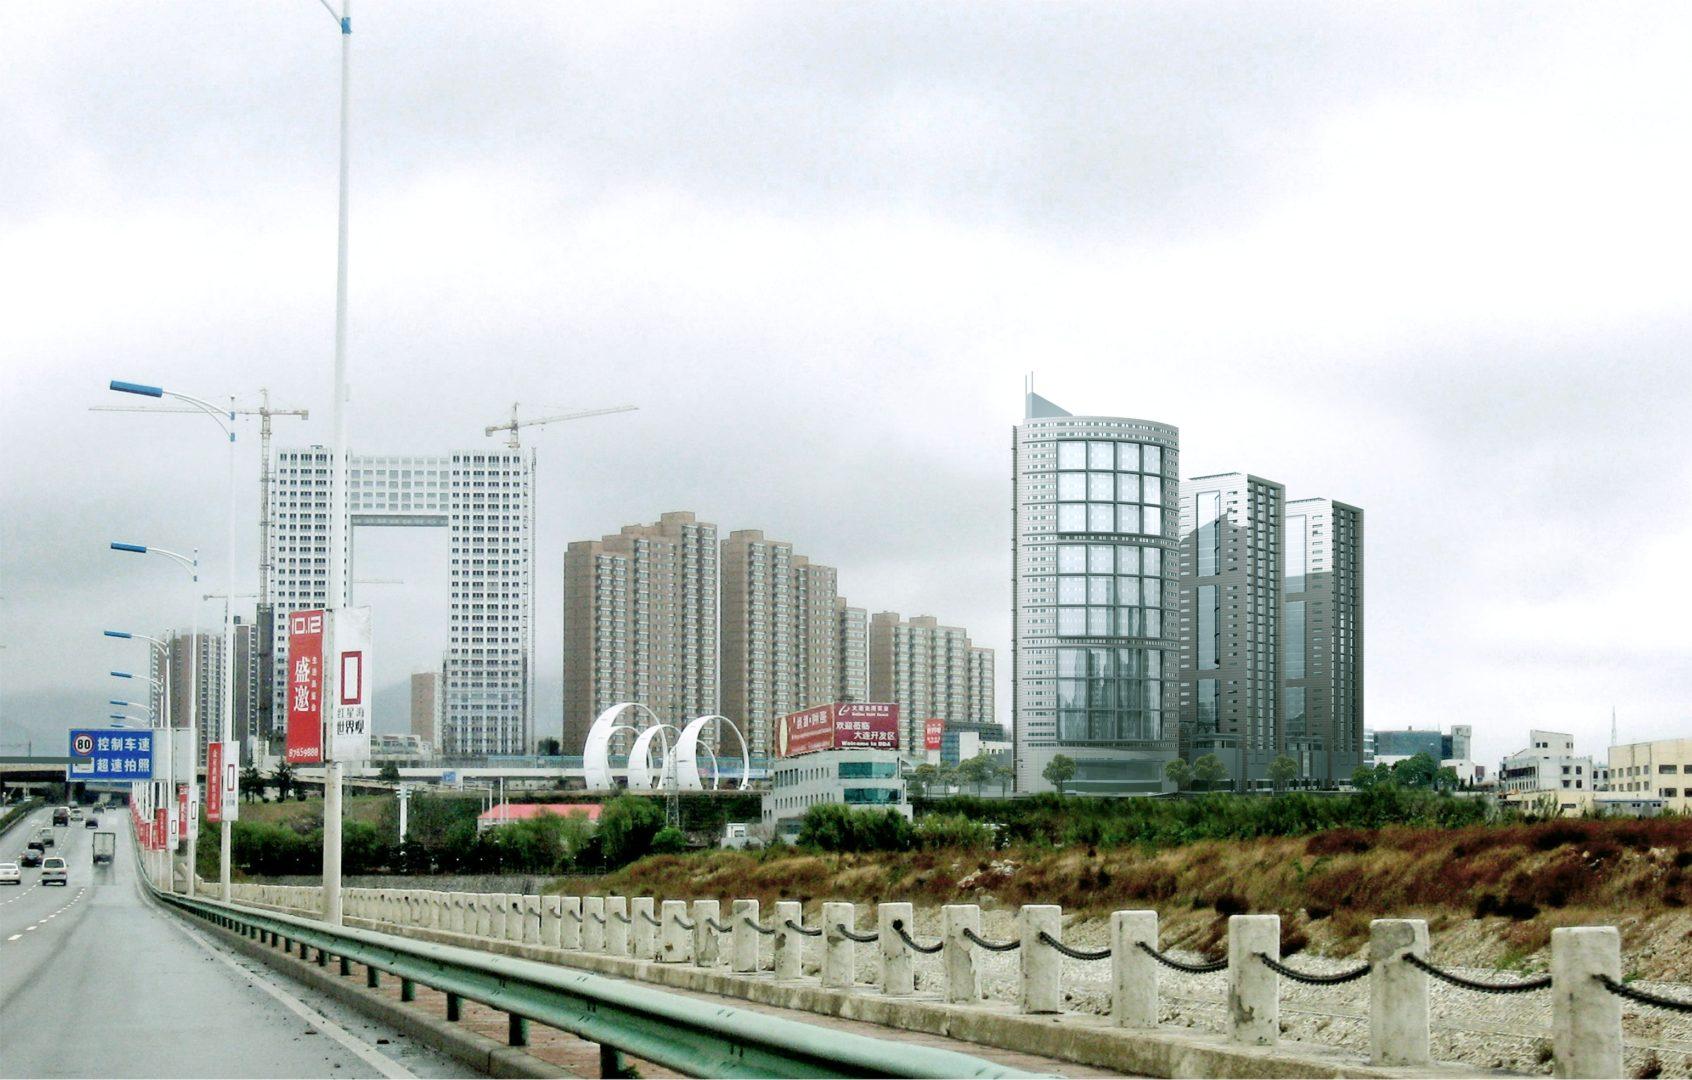 Wohn & Shoppingareal Dalian